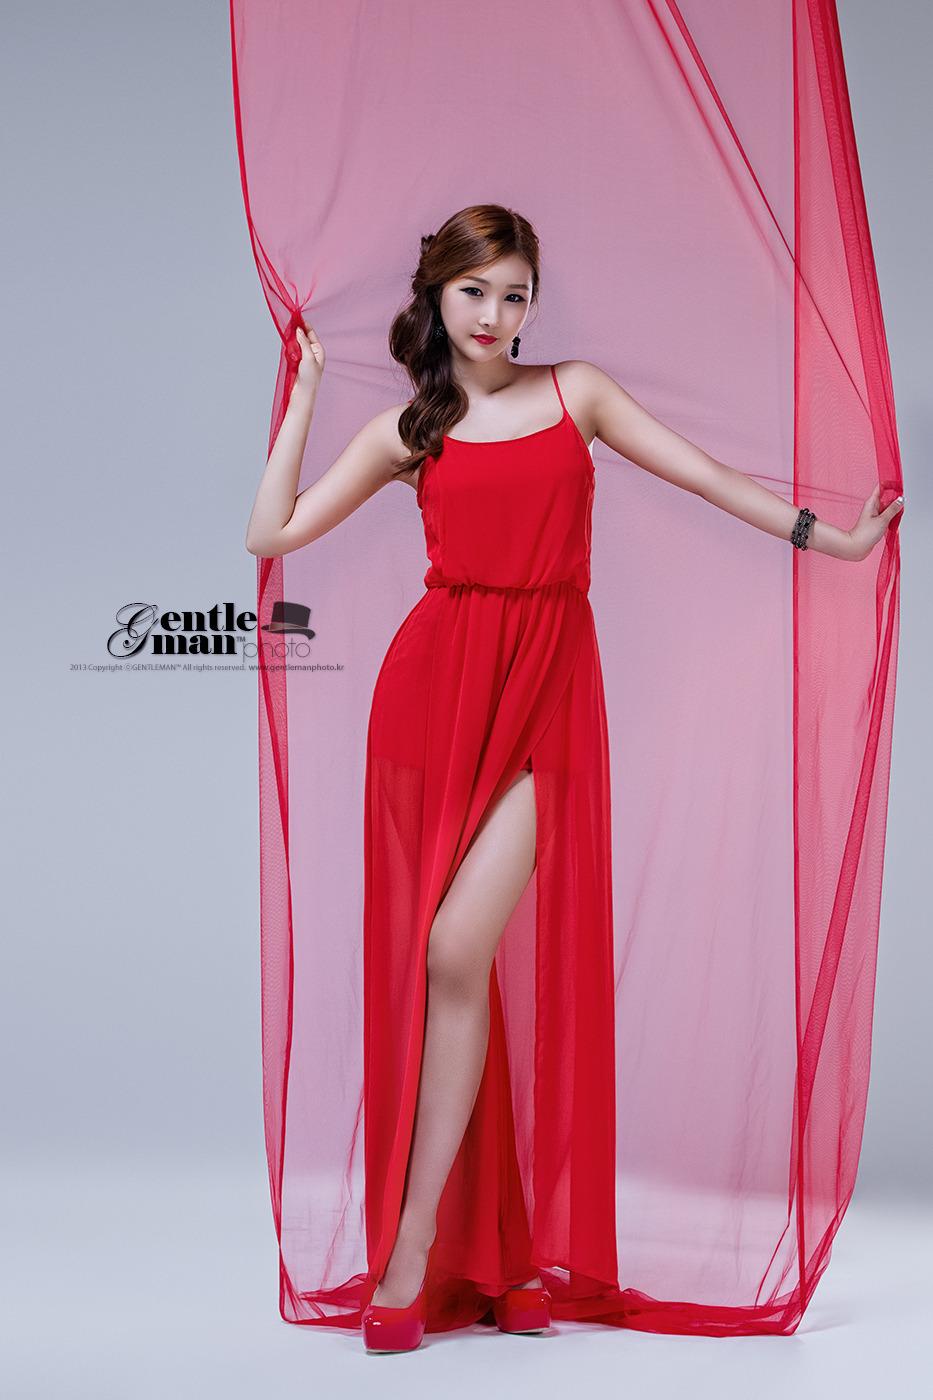 Han Song Yee - Hot Red ~ Cute Girl - Asian Girl - Korean